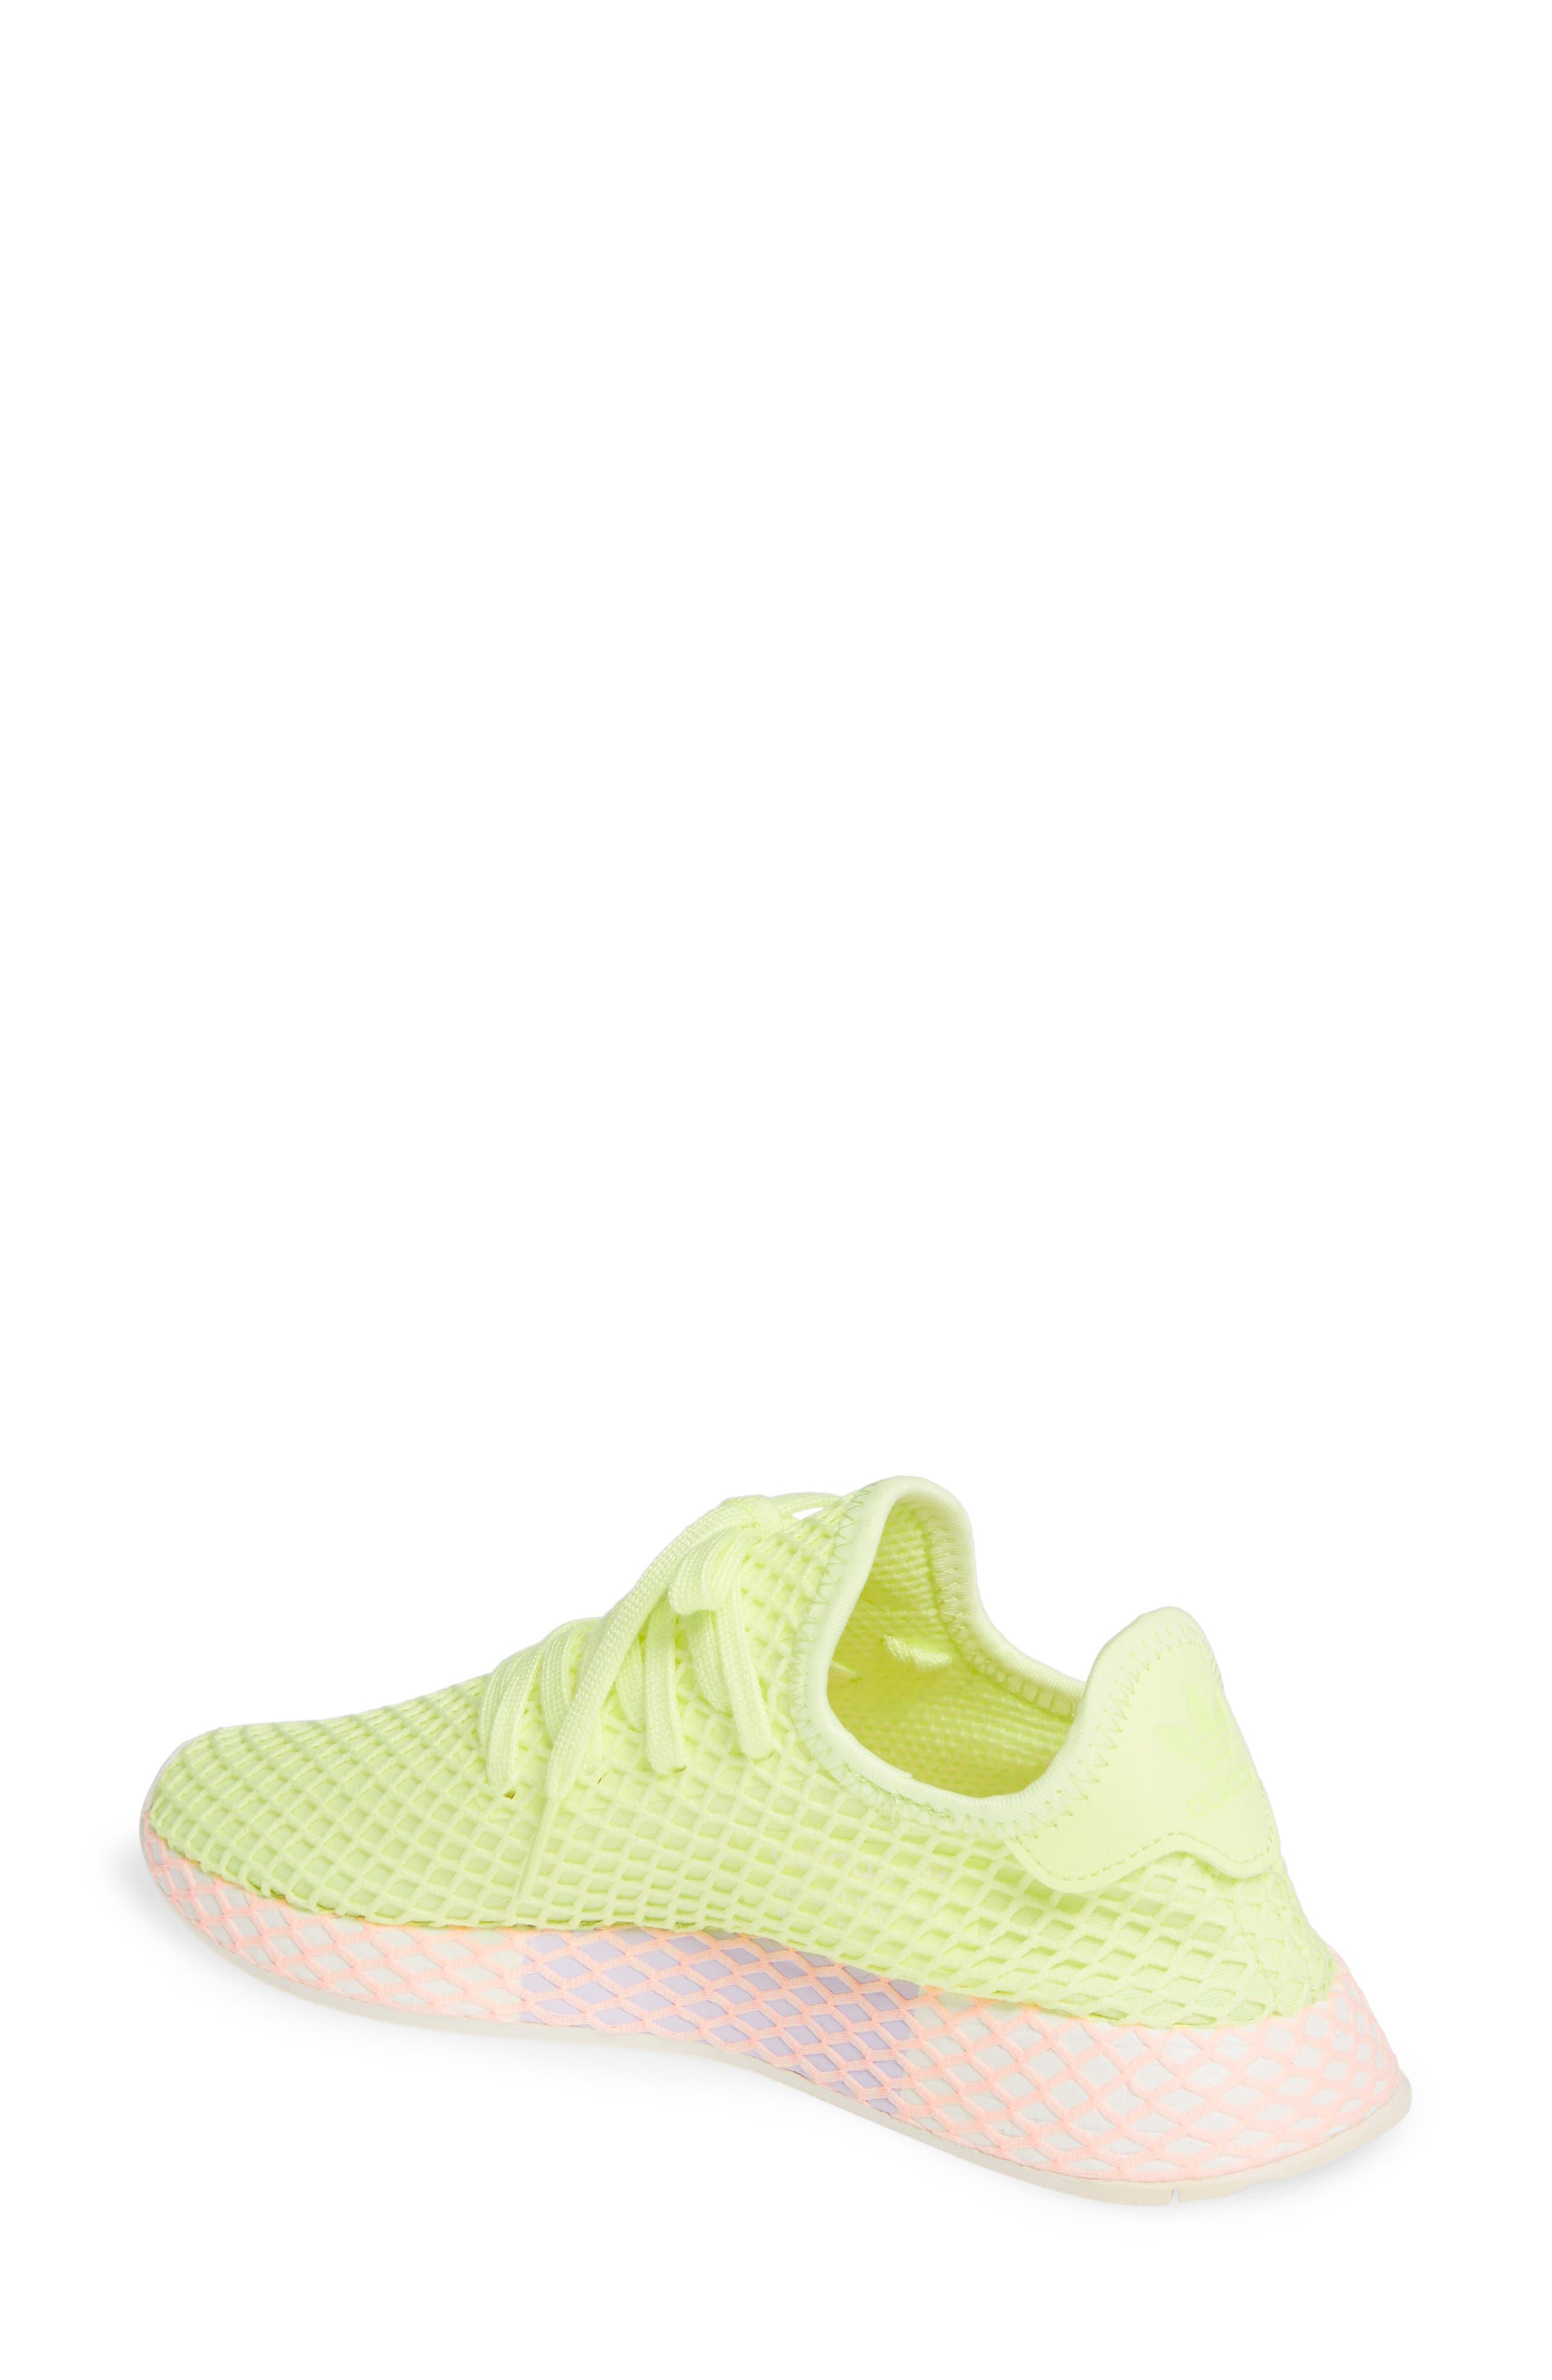 Deerupt Runner Sneaker,                             Alternate thumbnail 2, color,                             700